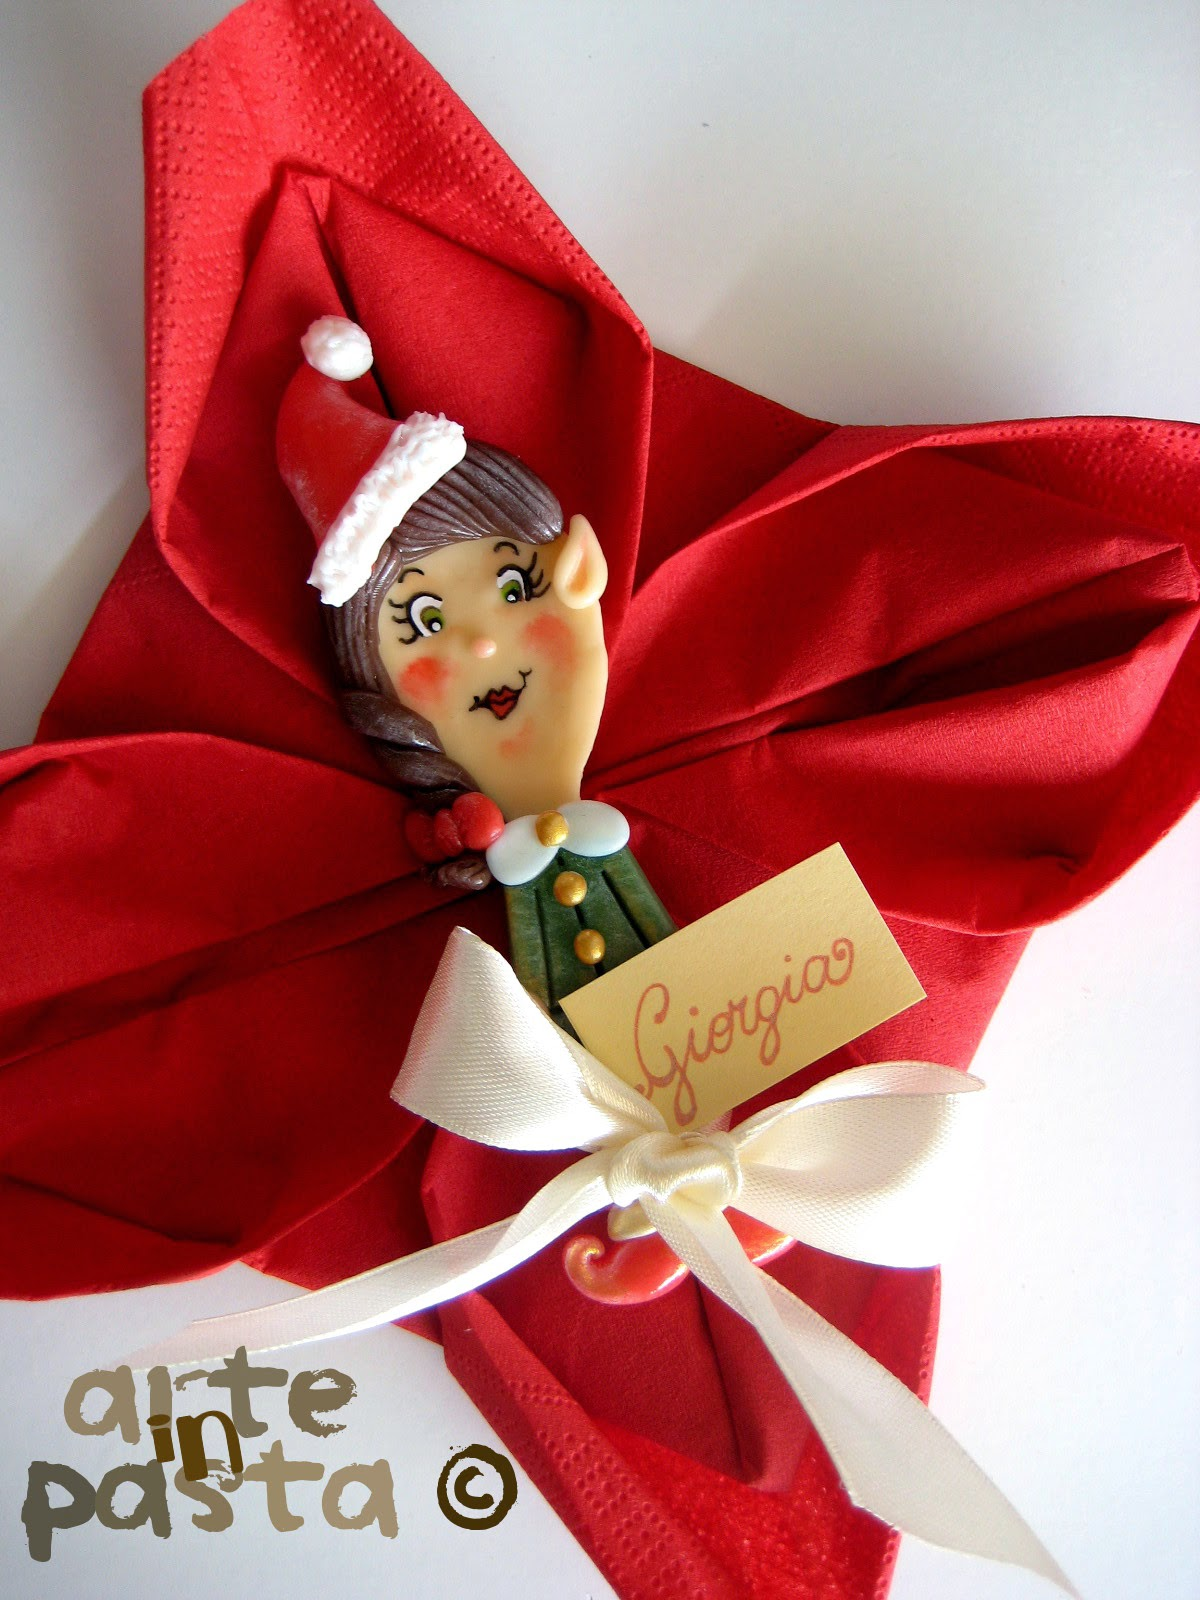 Arteinpasta originali idee regalo per natale le posate for Idee per regali originali